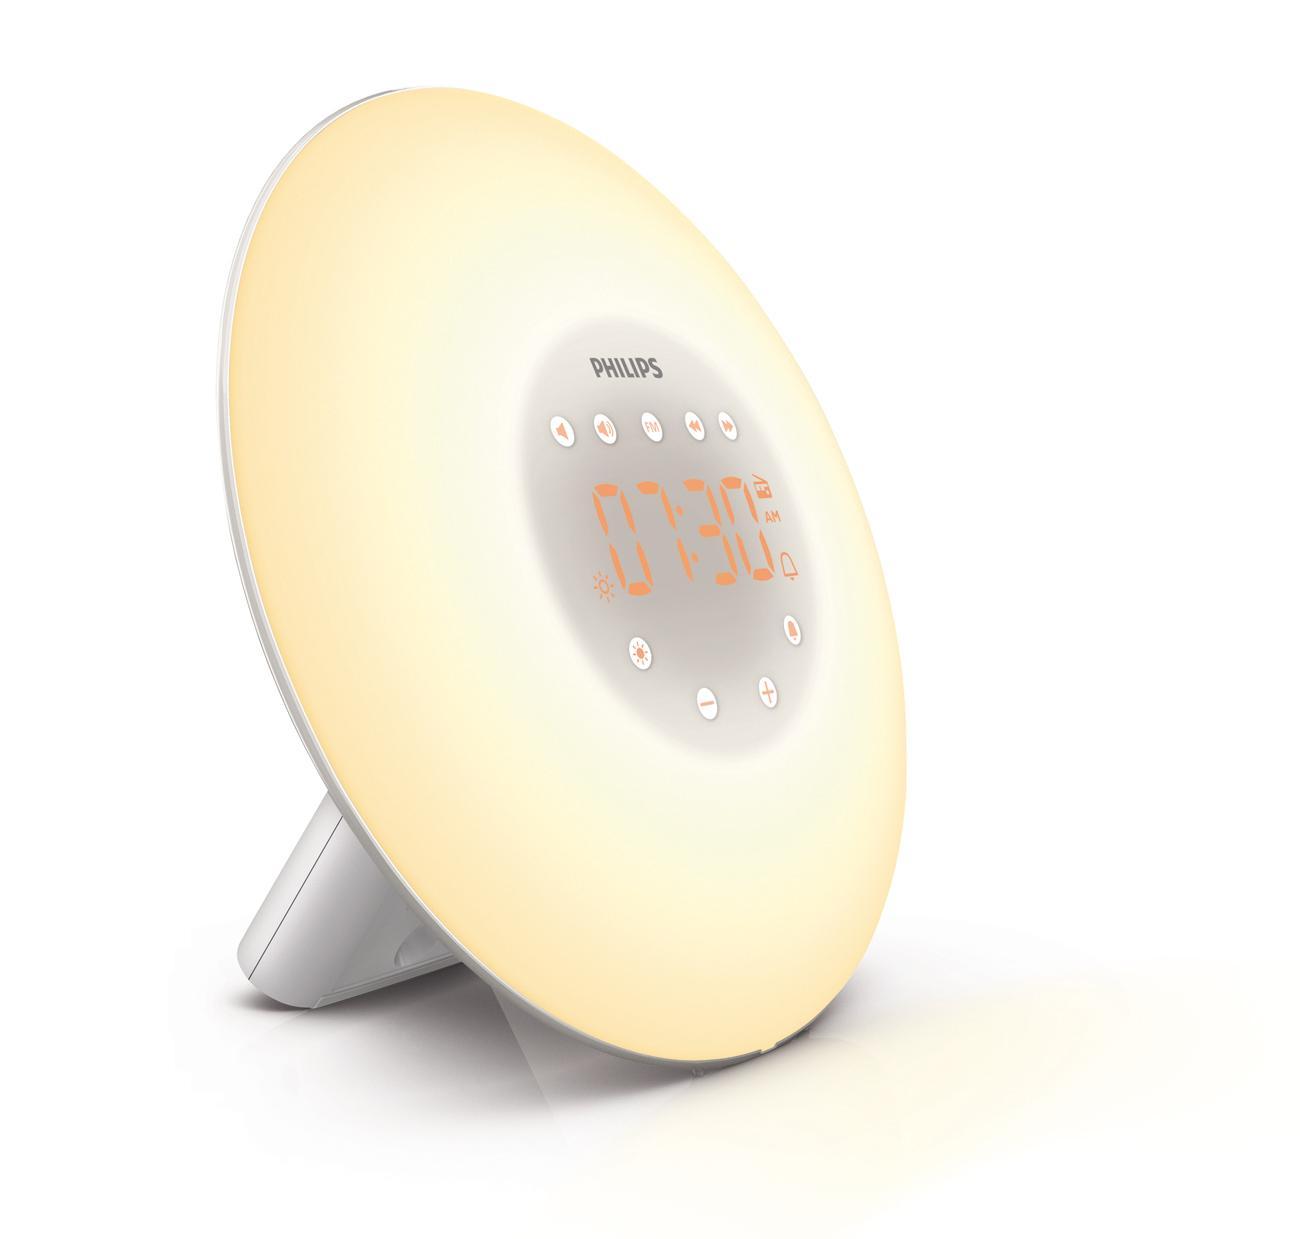 Philips Wake Up Light, Sunrise Simulation, Light Therapy, Home Design Ideas